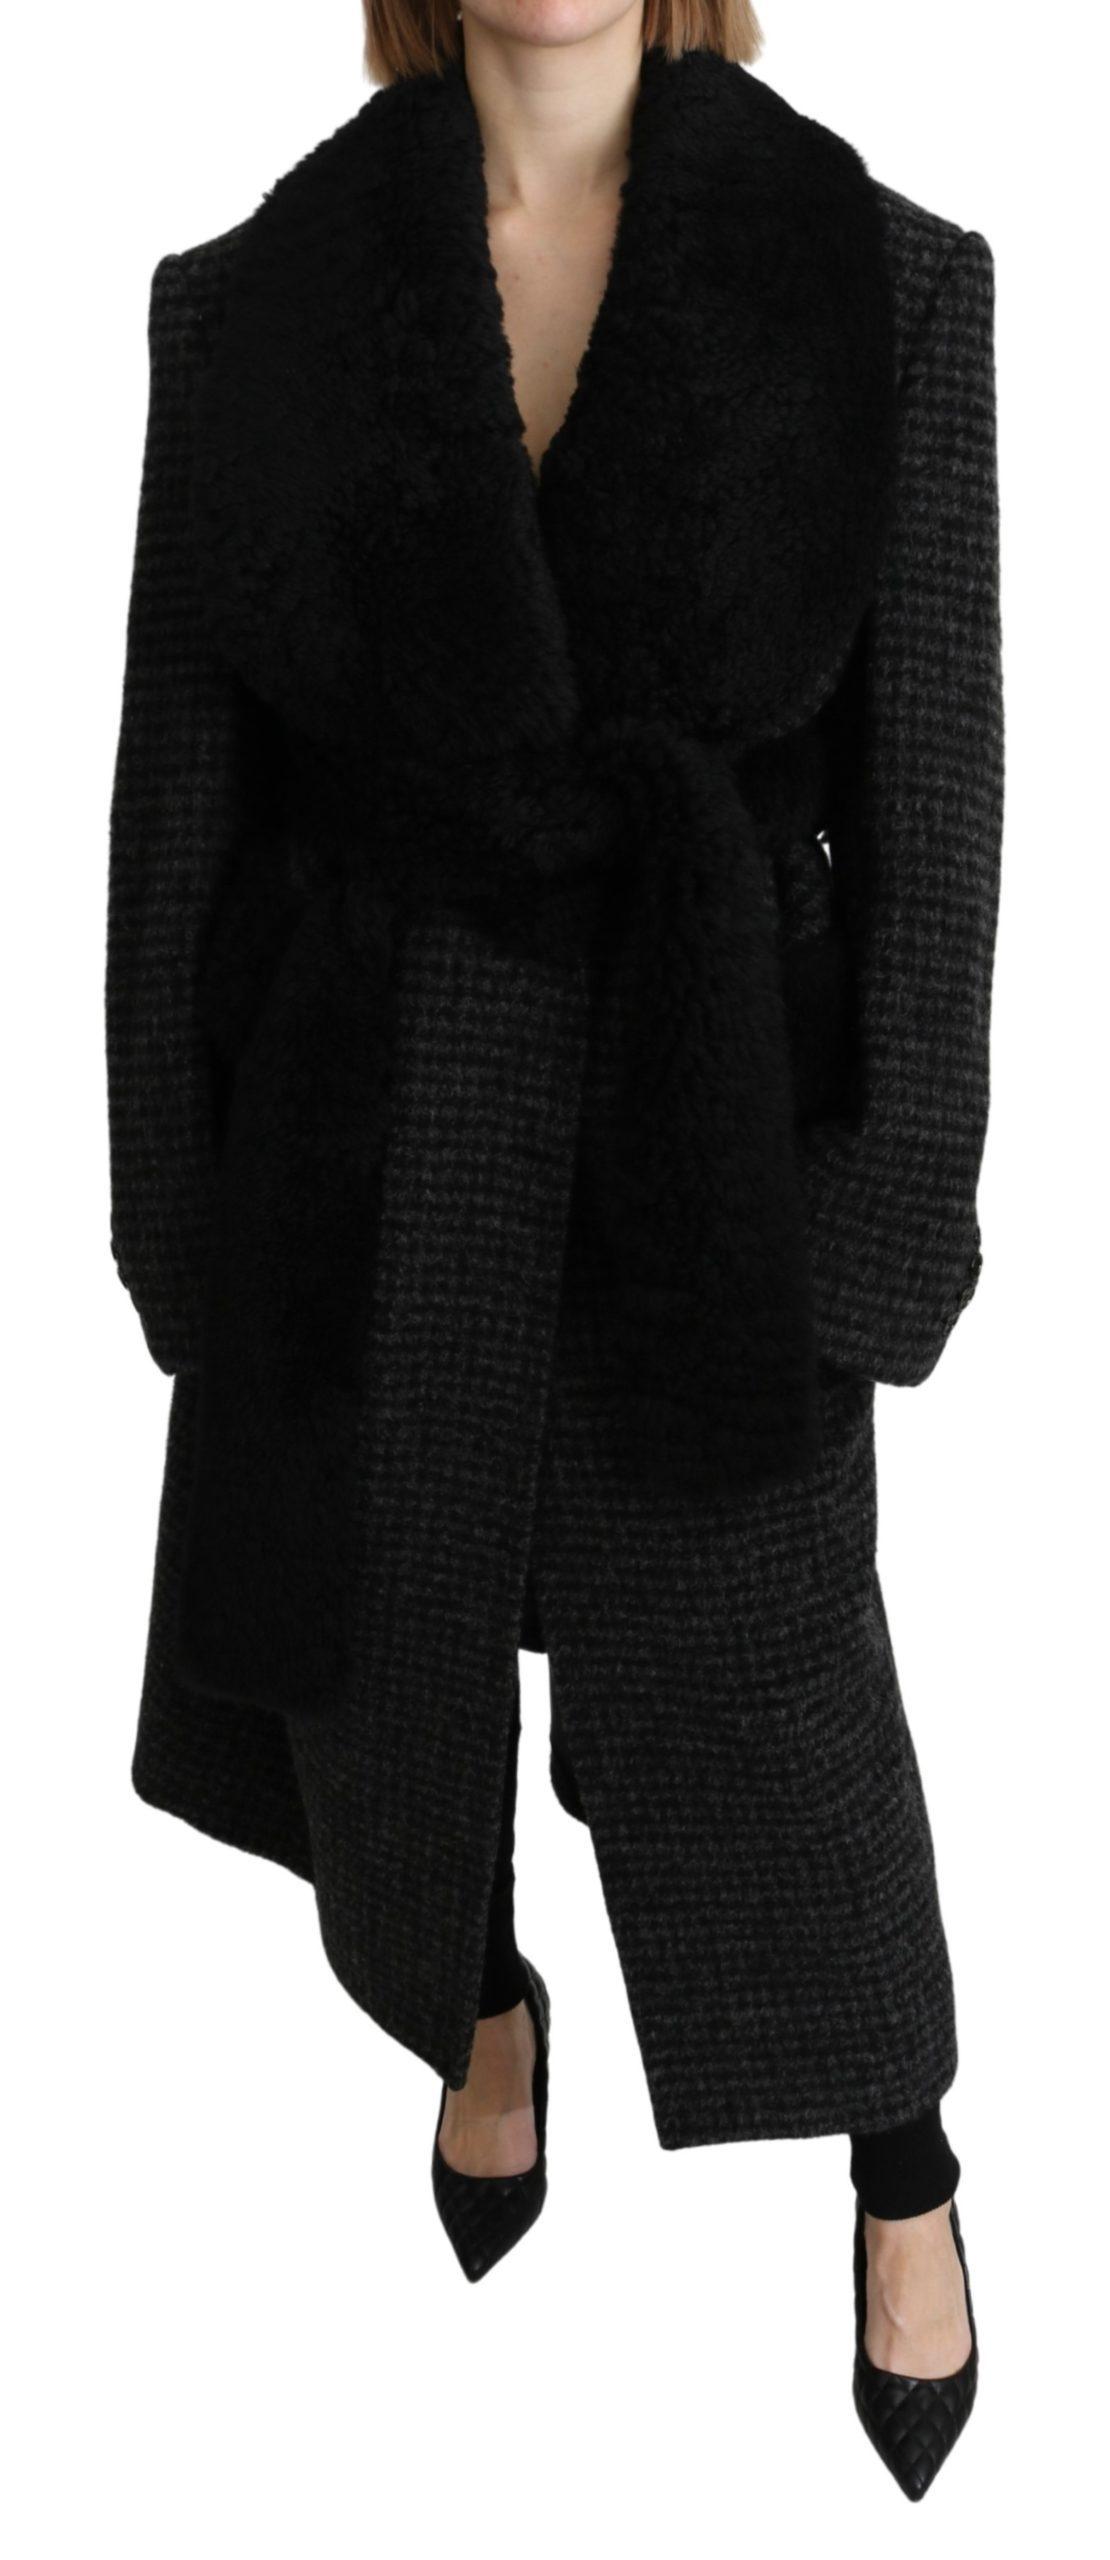 Dolce & Gabbana Women's Fur Blazer Trenchcoat Alpaca Jacket Black JKT2639 - IT40 | M